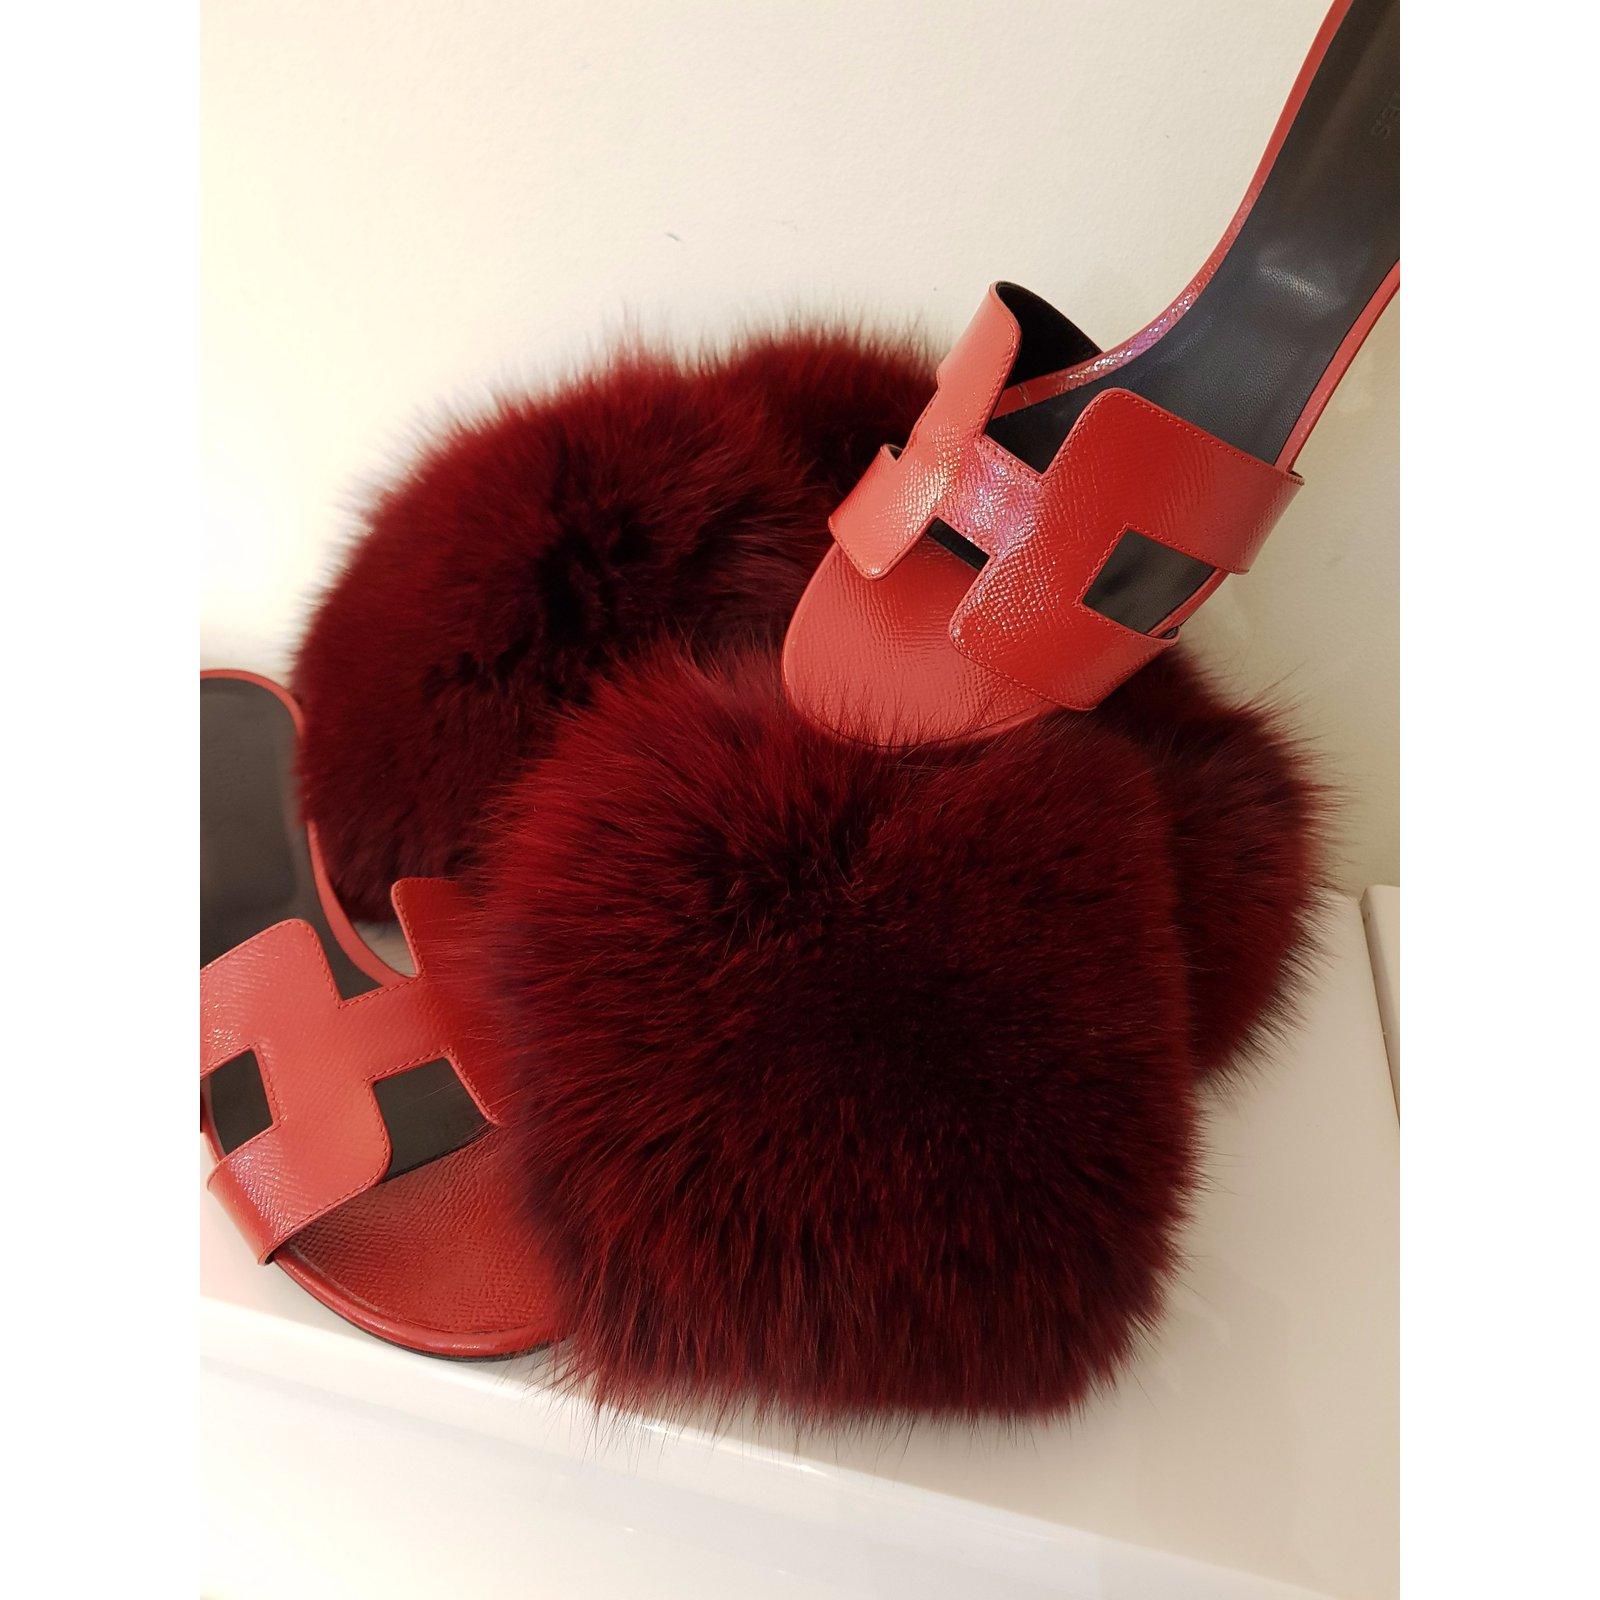 4fd1c07d3c24 Hermès OASIS EPSOM VERNIS Sandals Patent leather Red ref.51922 - Joli Closet